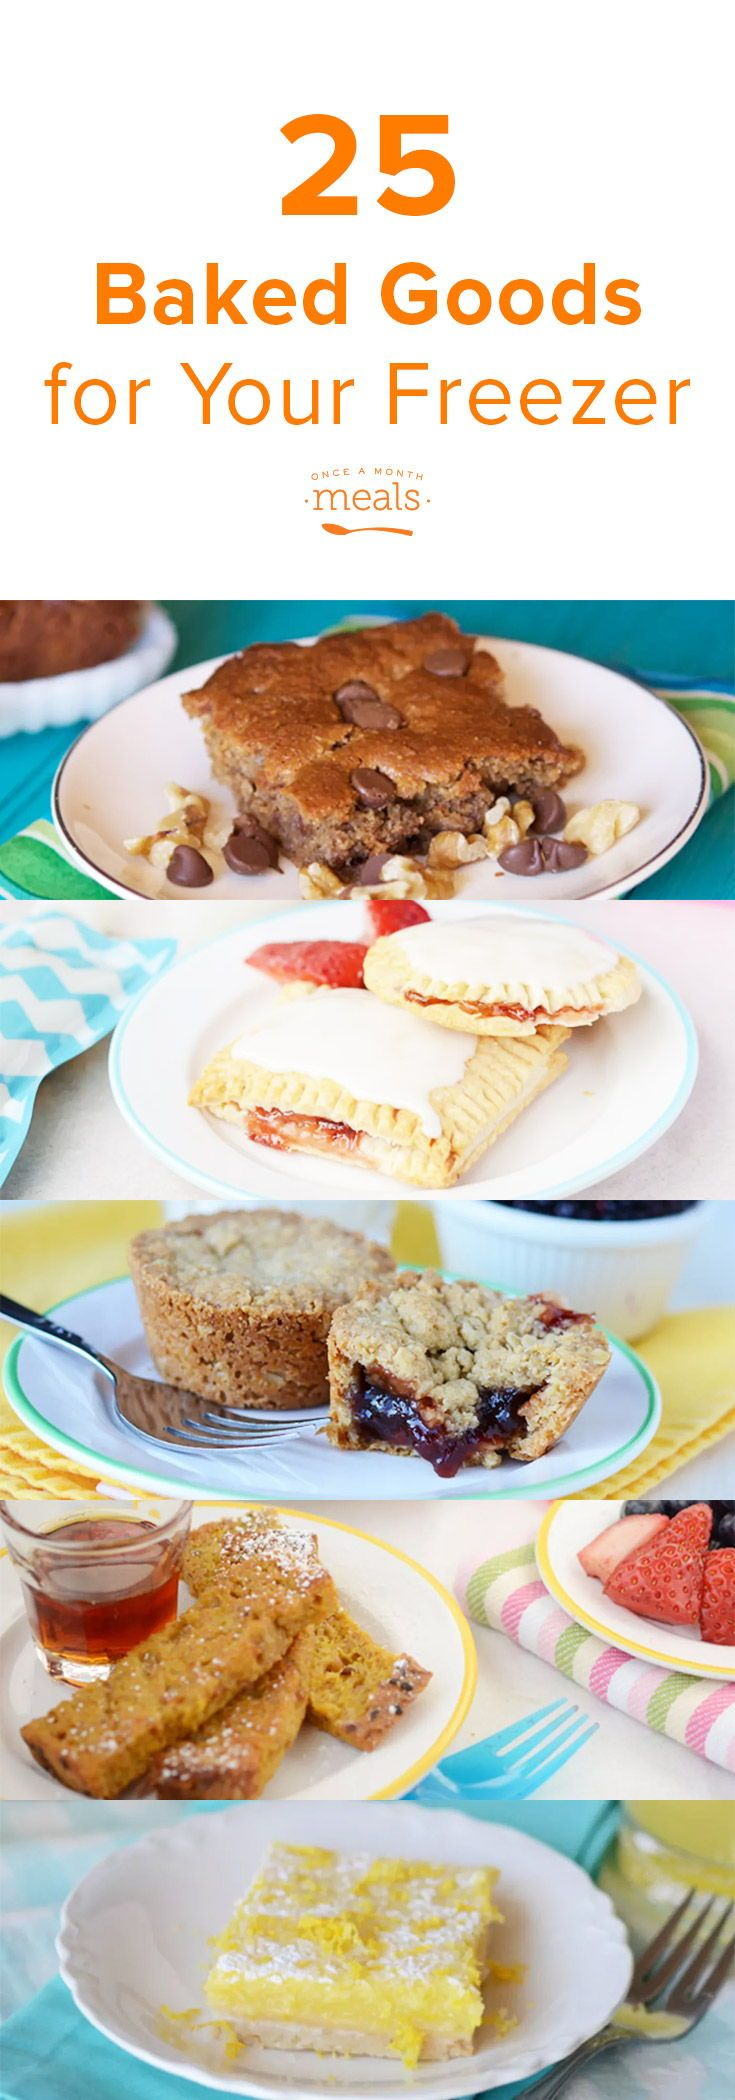 Top 25 Freezer Friendly Baked Goods